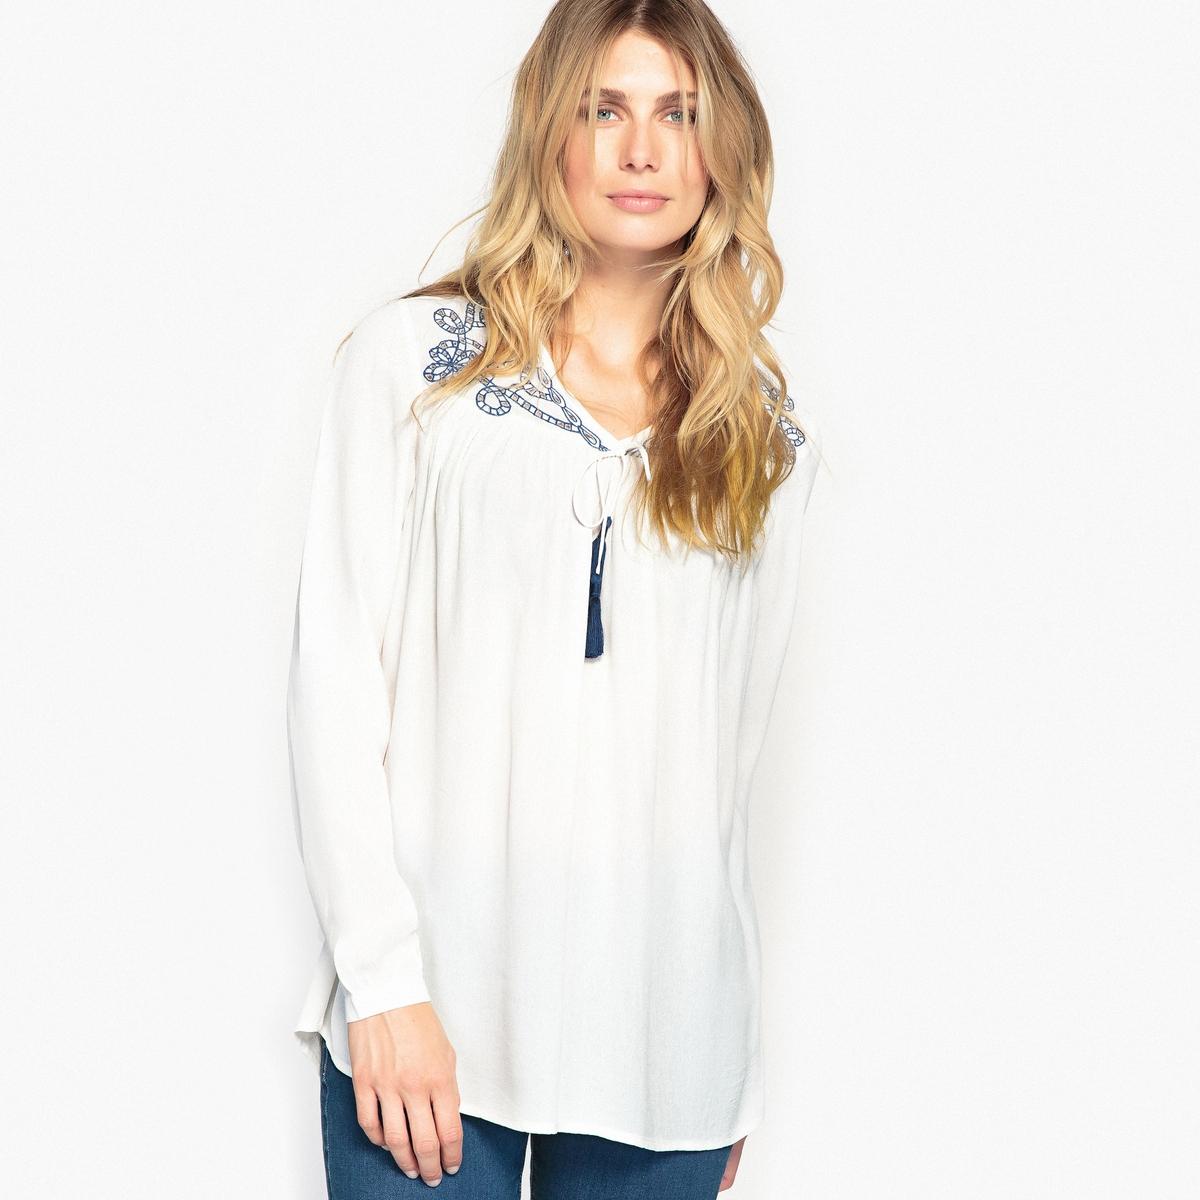 Блузка с вышивкой solo1 с